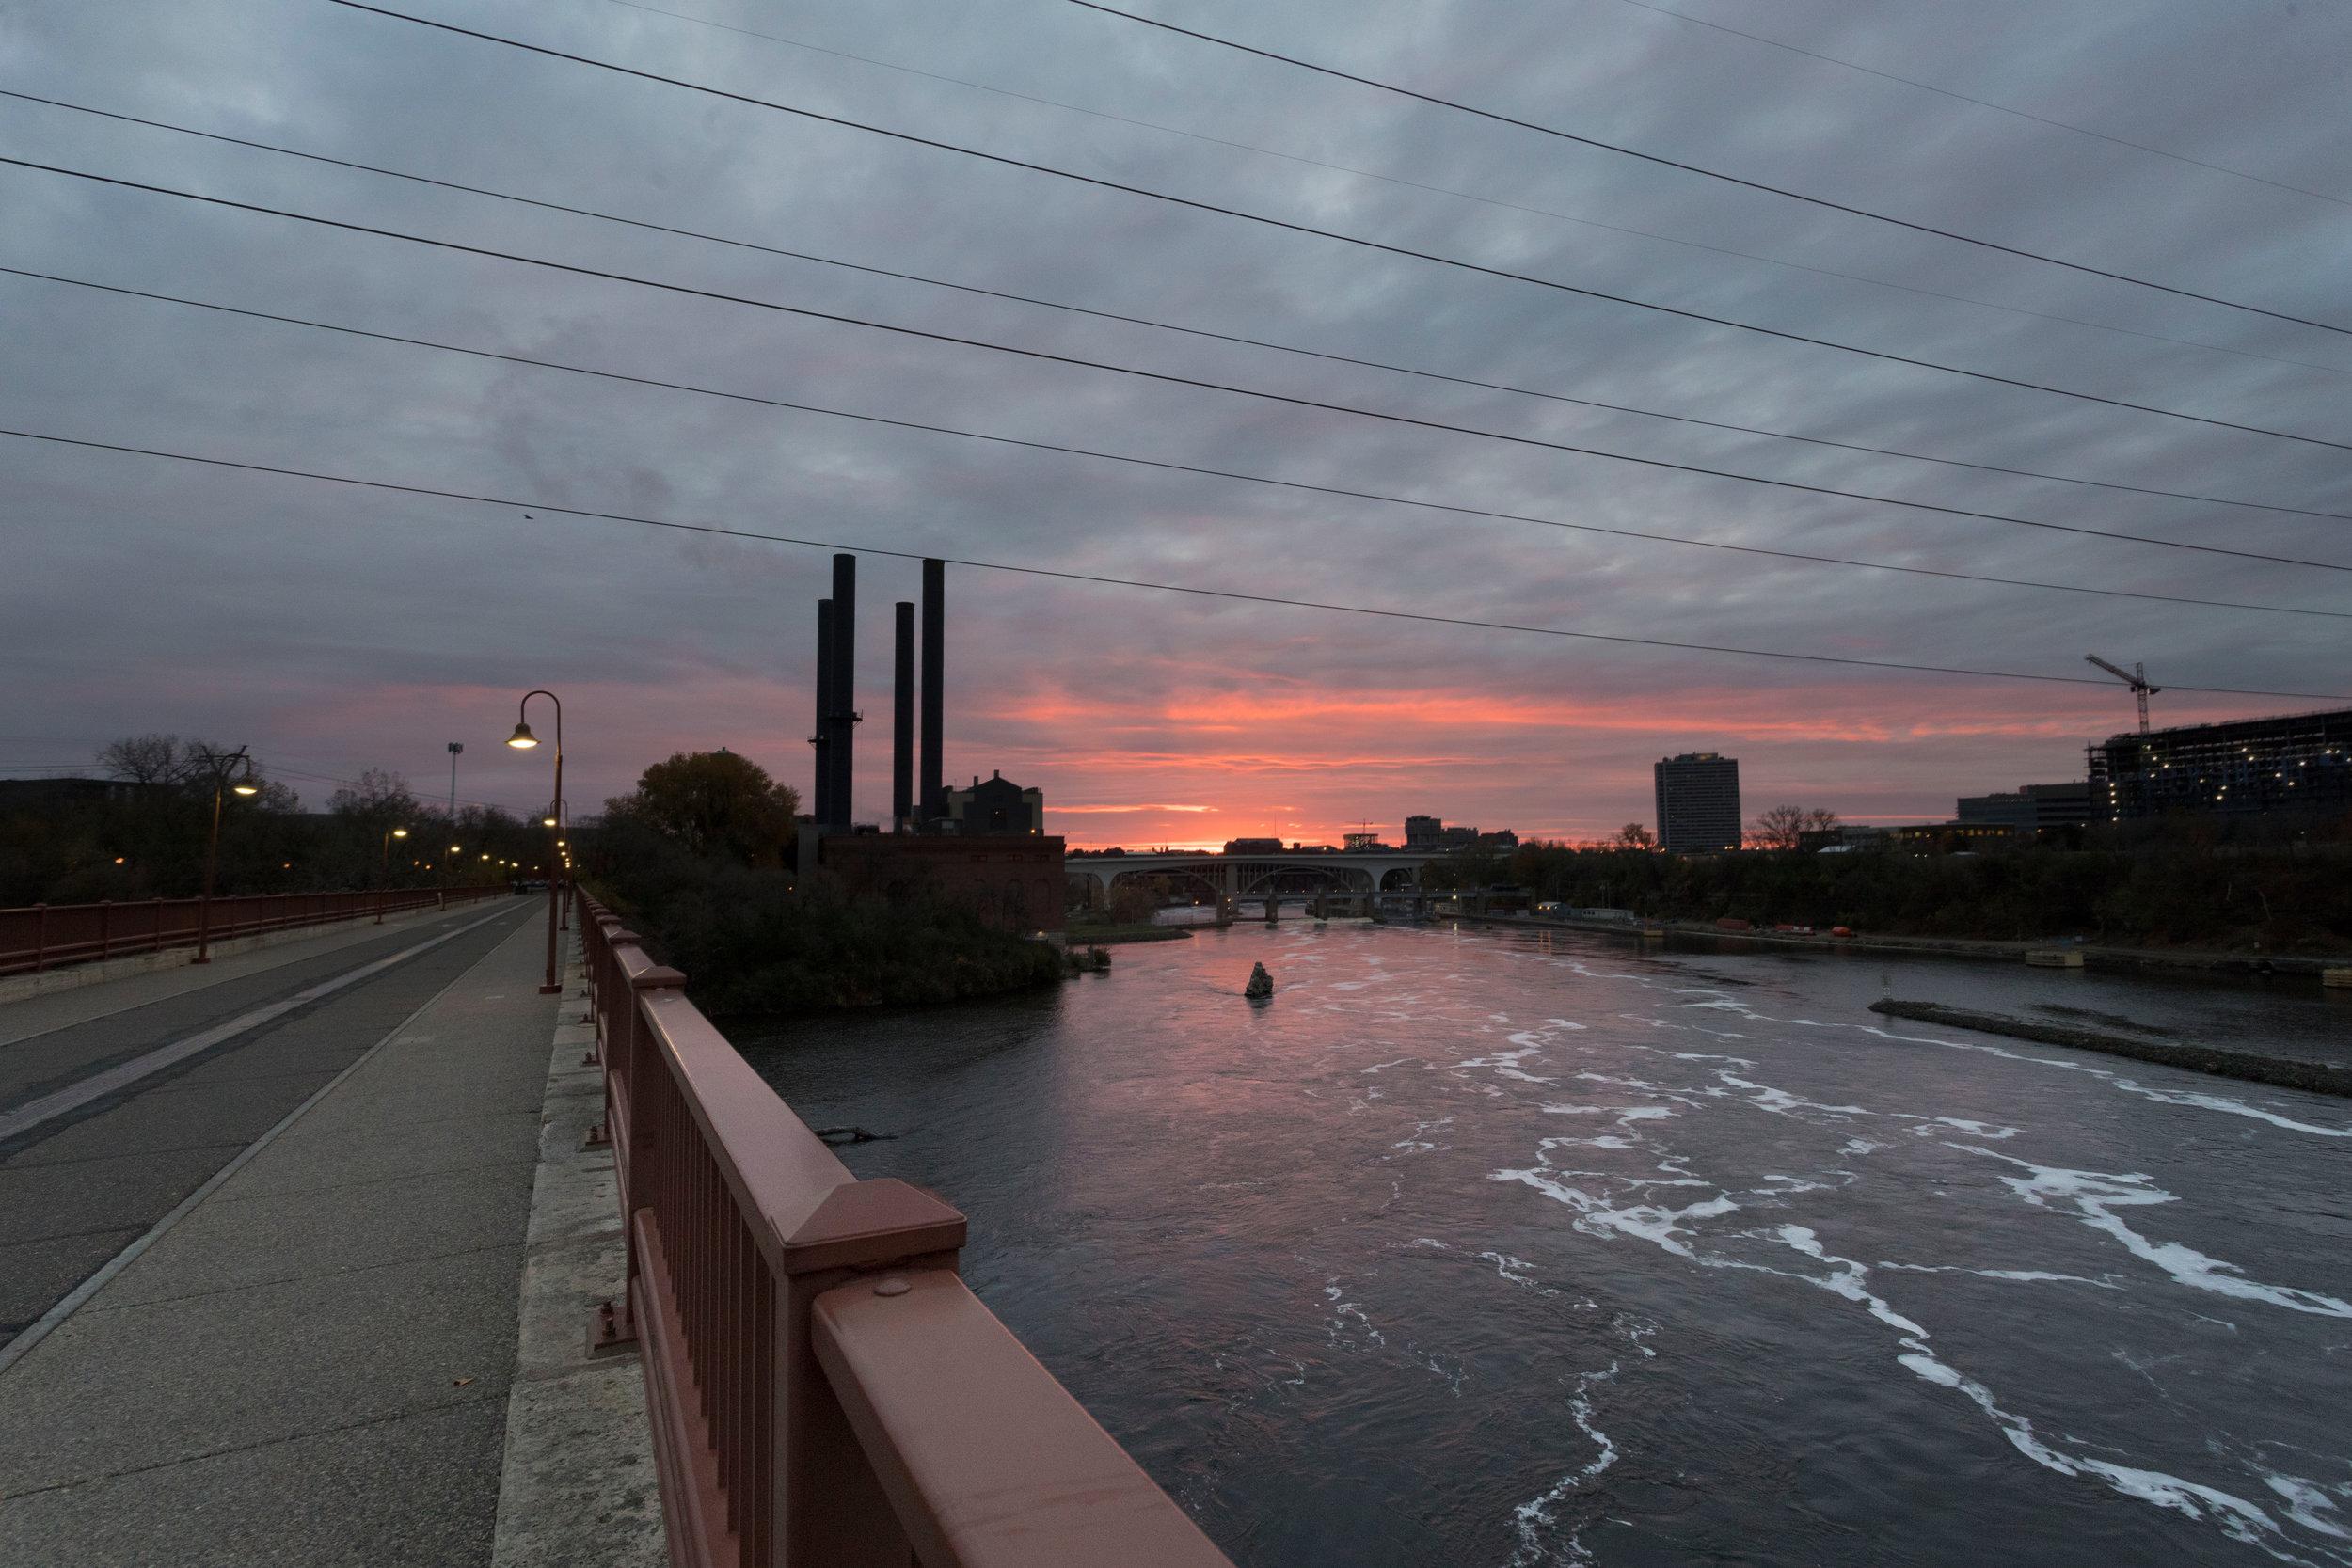 october 29, 2017  stone arch bridge - minneapolis, minnesota